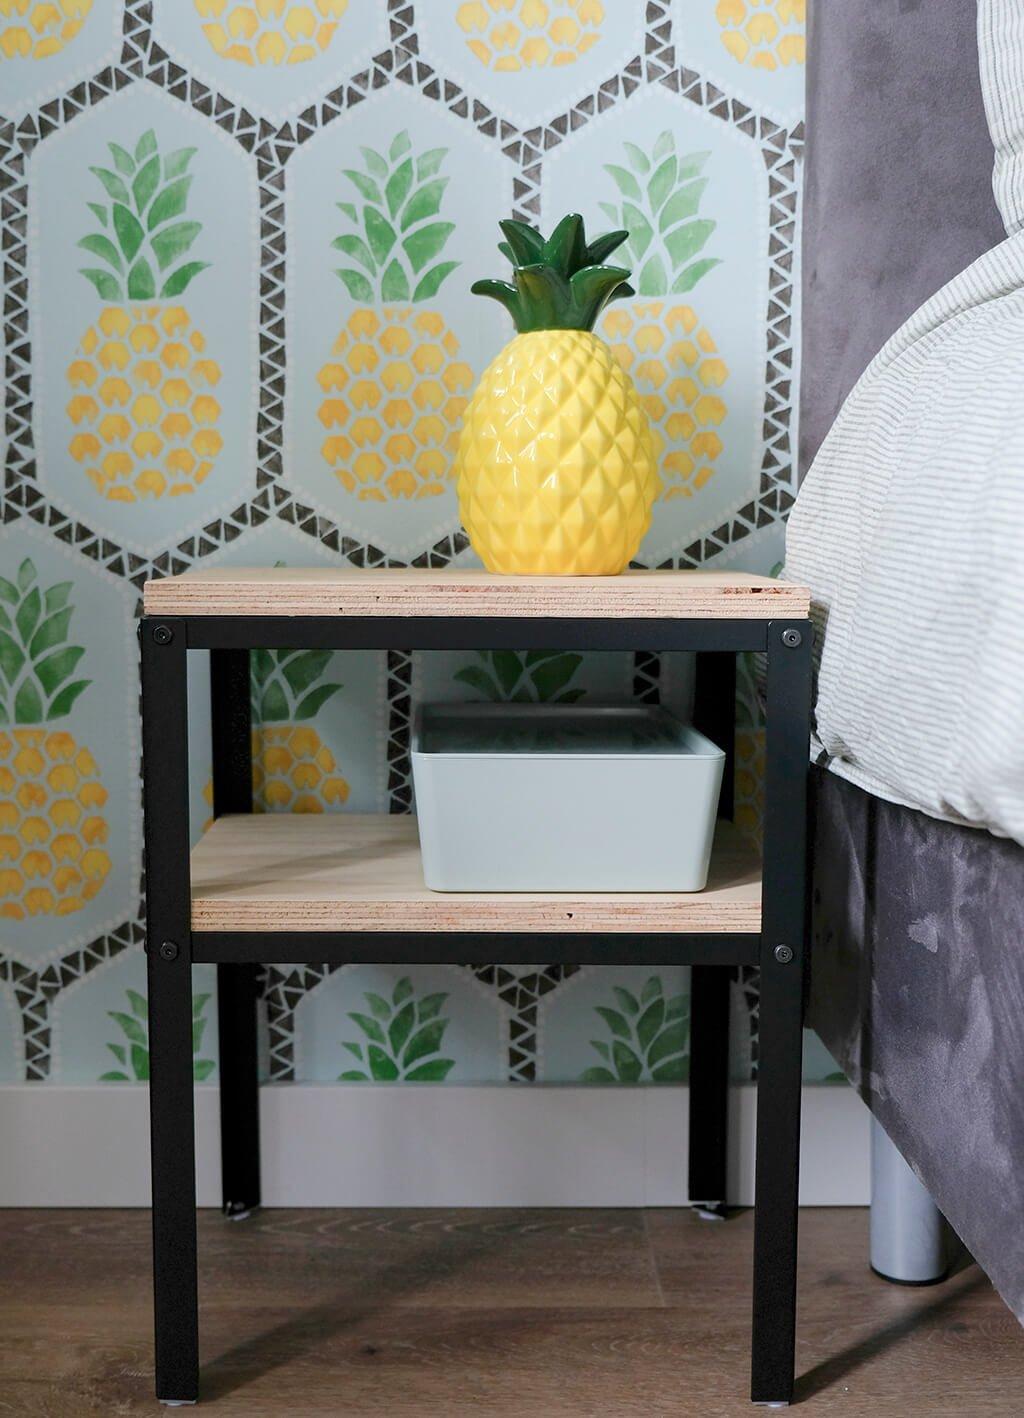 KNARREVIK nightstands with plywood